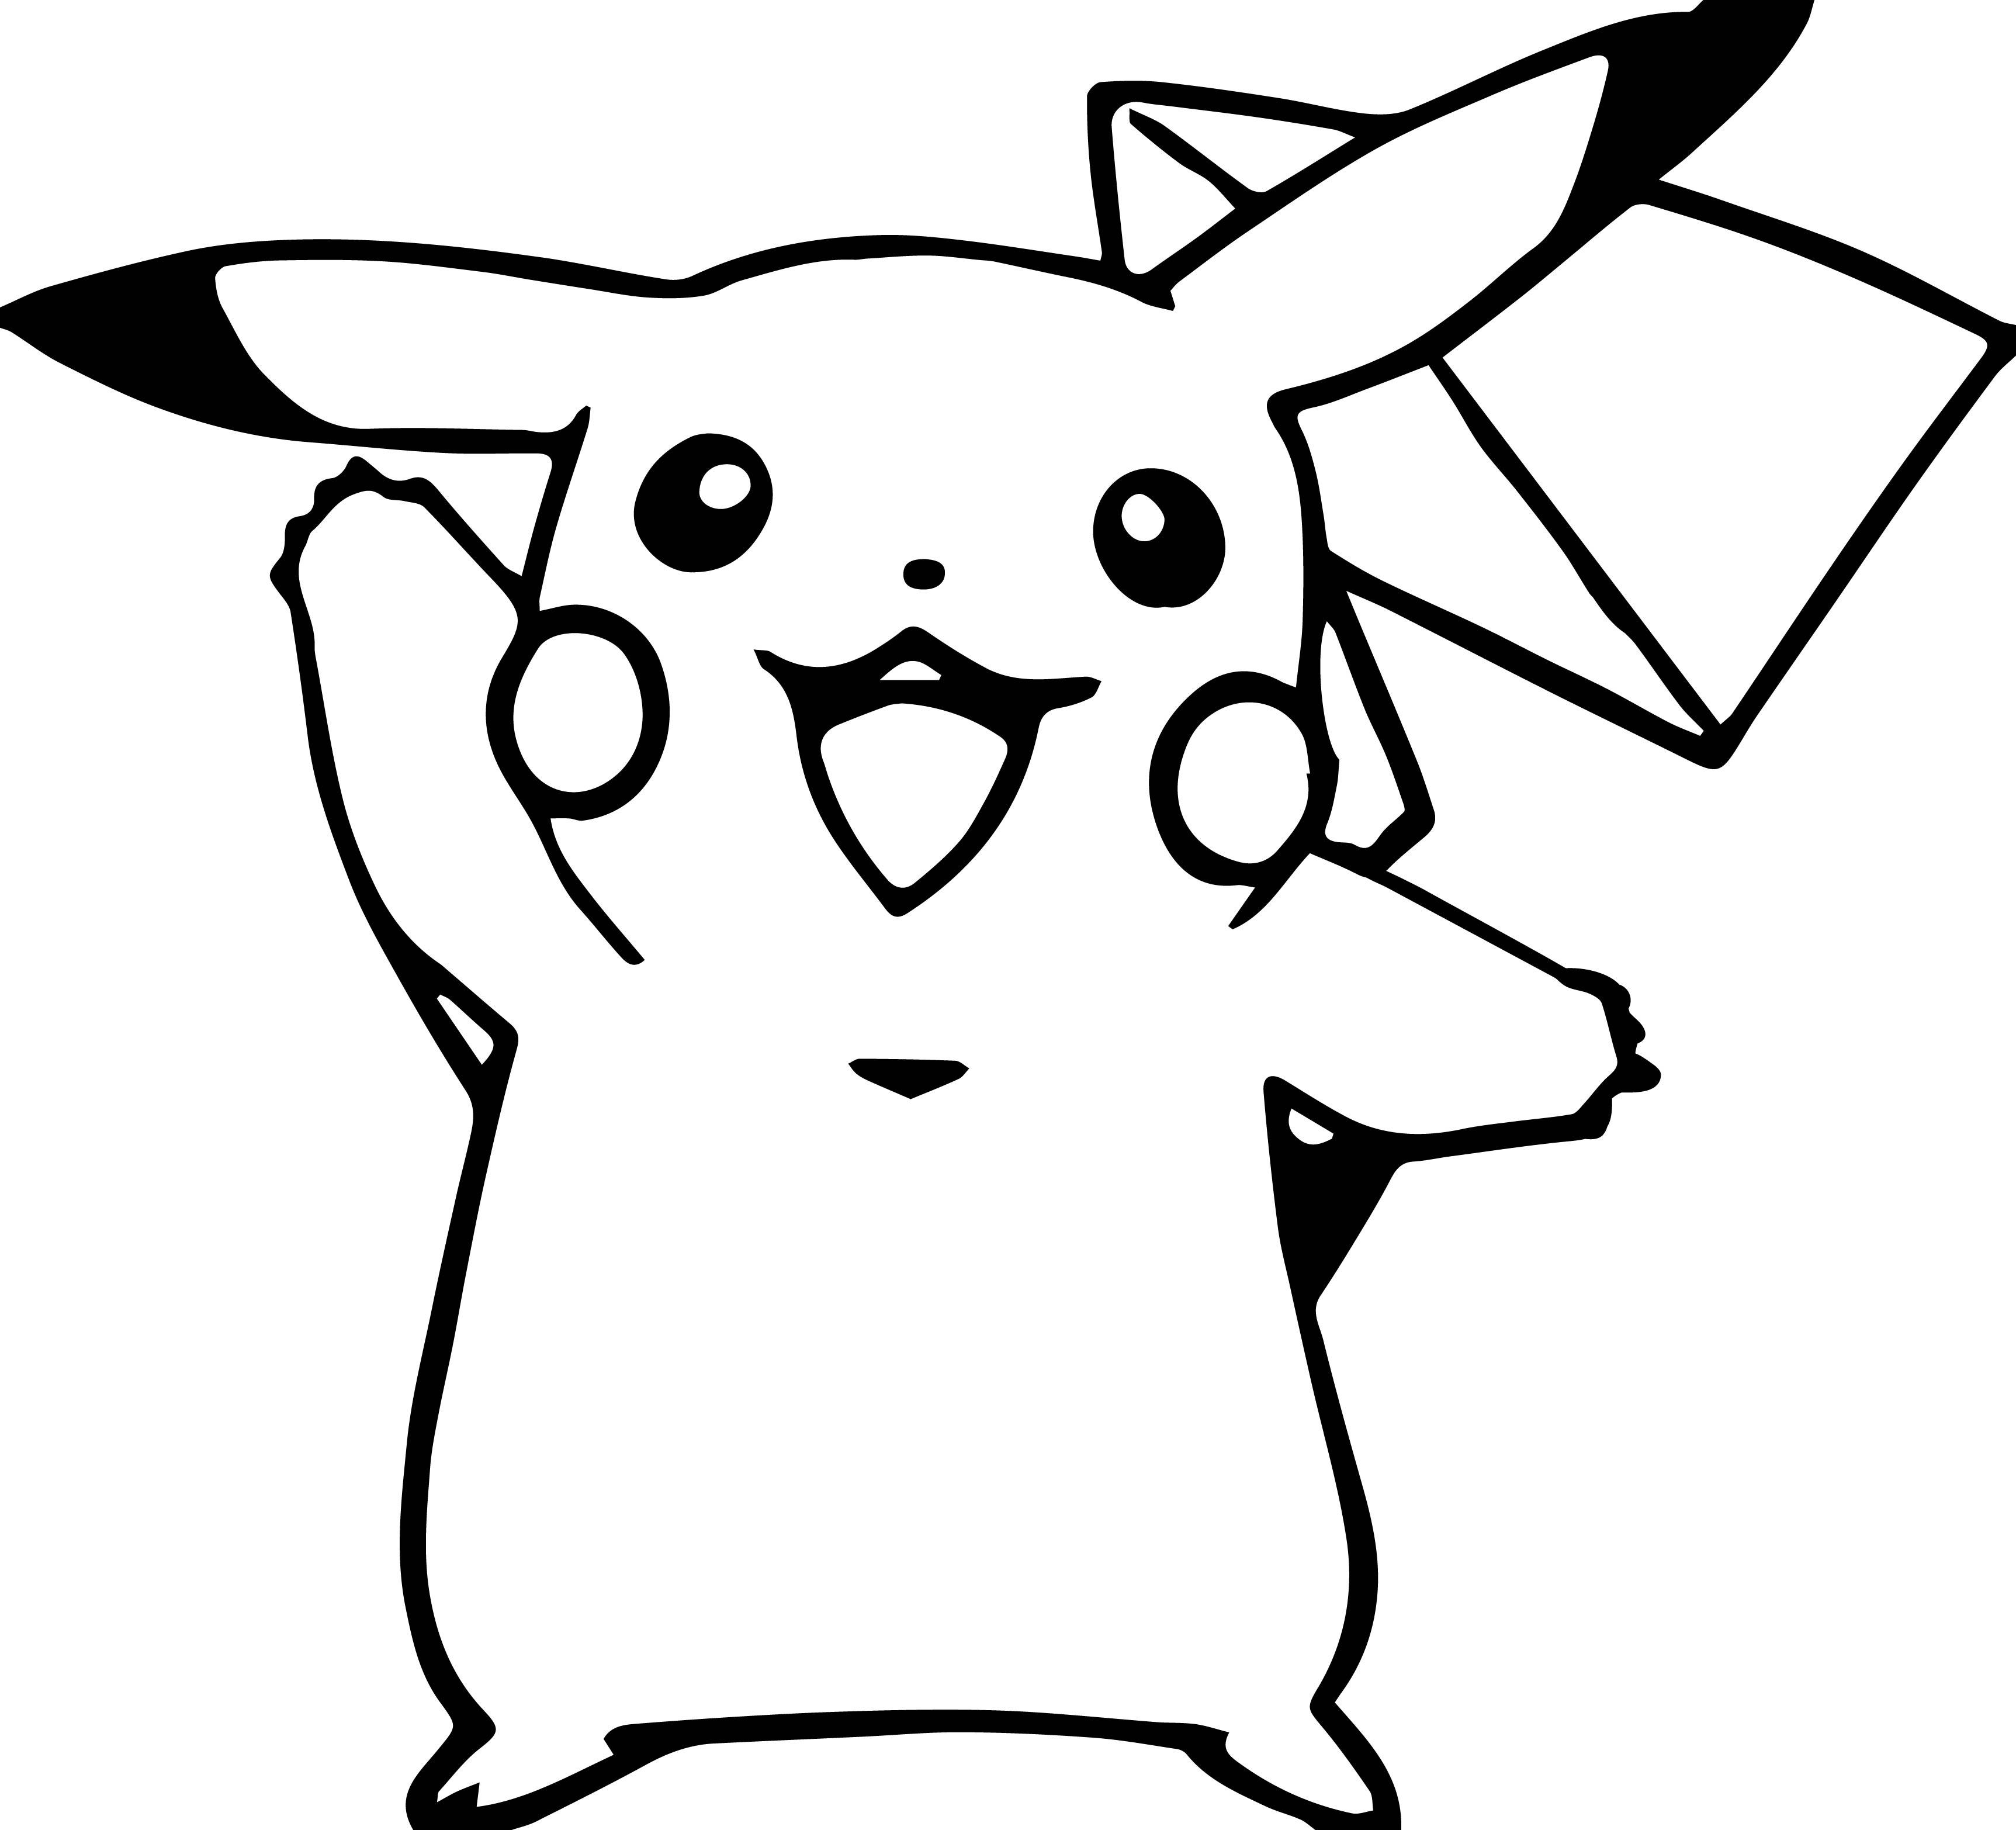 3450x3131 Cool Pokemon Coloring Pages I Choose You! Pokemon